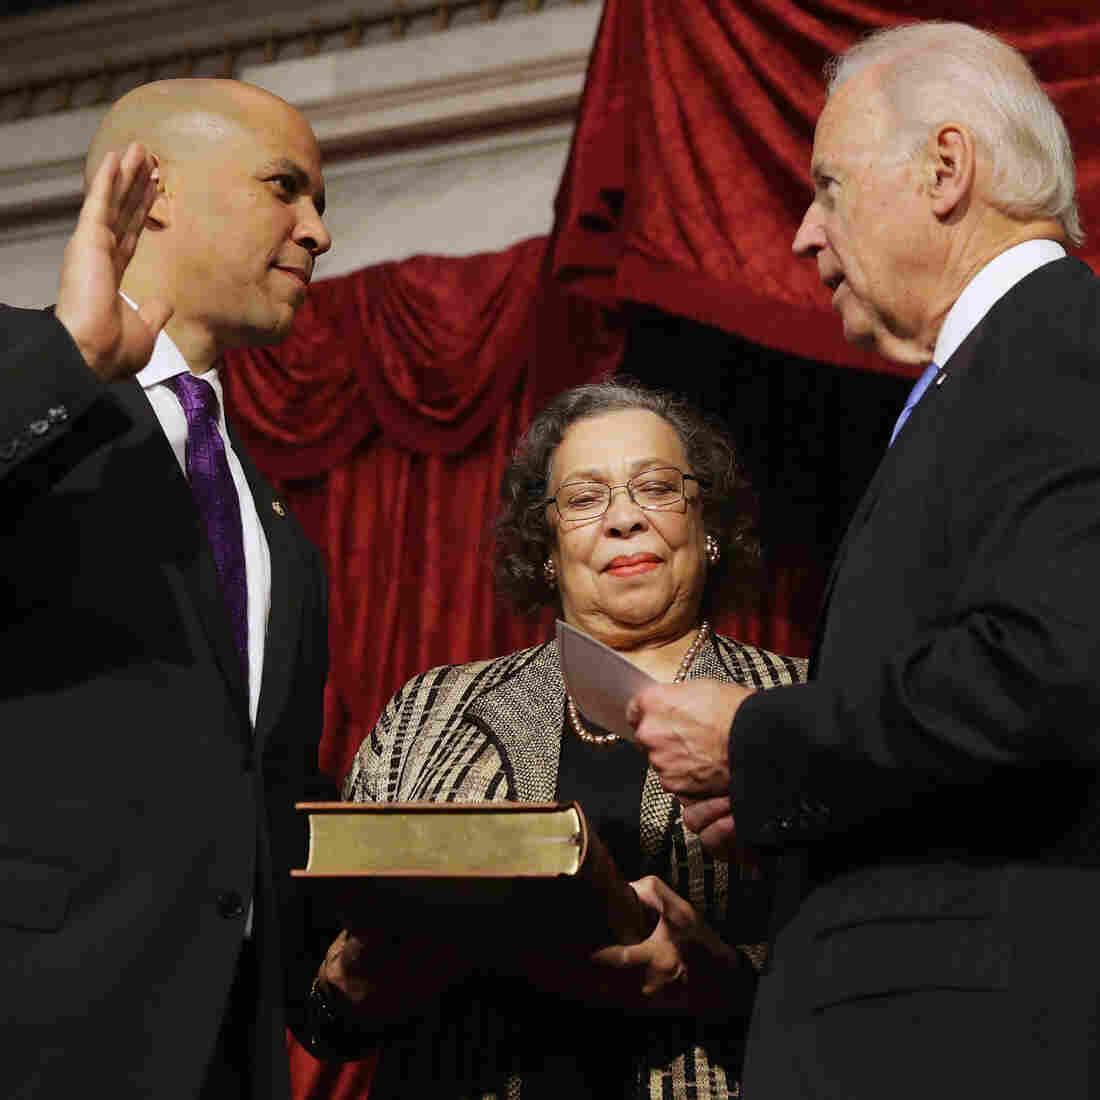 Vice President Joe Biden swears in Sen. Cory Booker (D-NJ) as his mother, Carolyn, holds a Bible on Thursday.